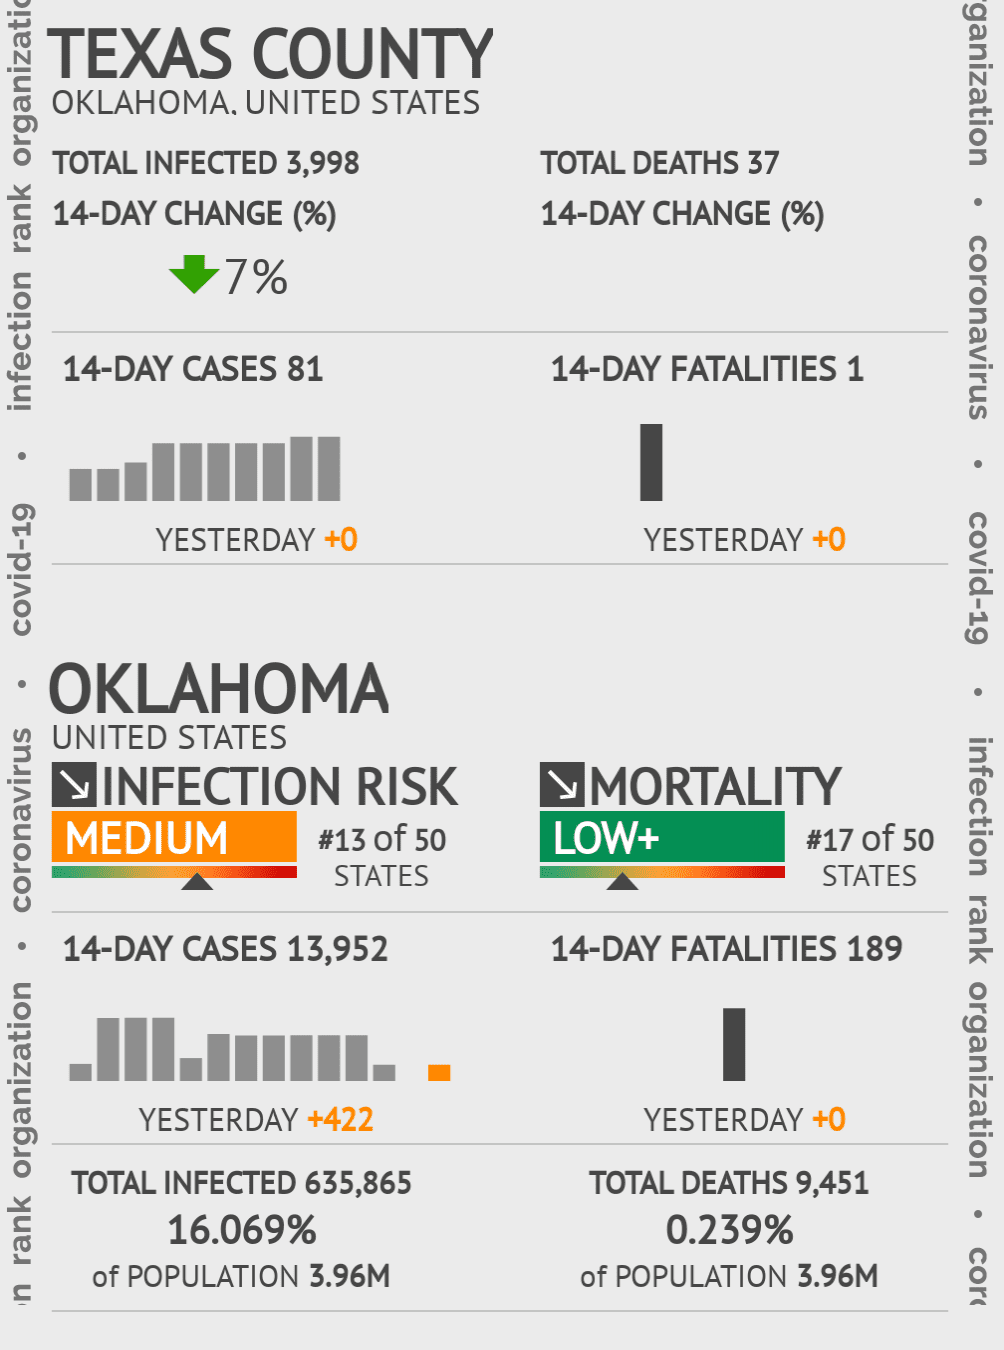 Texas County Coronavirus Covid-19 Risk of Infection on July 24, 2021